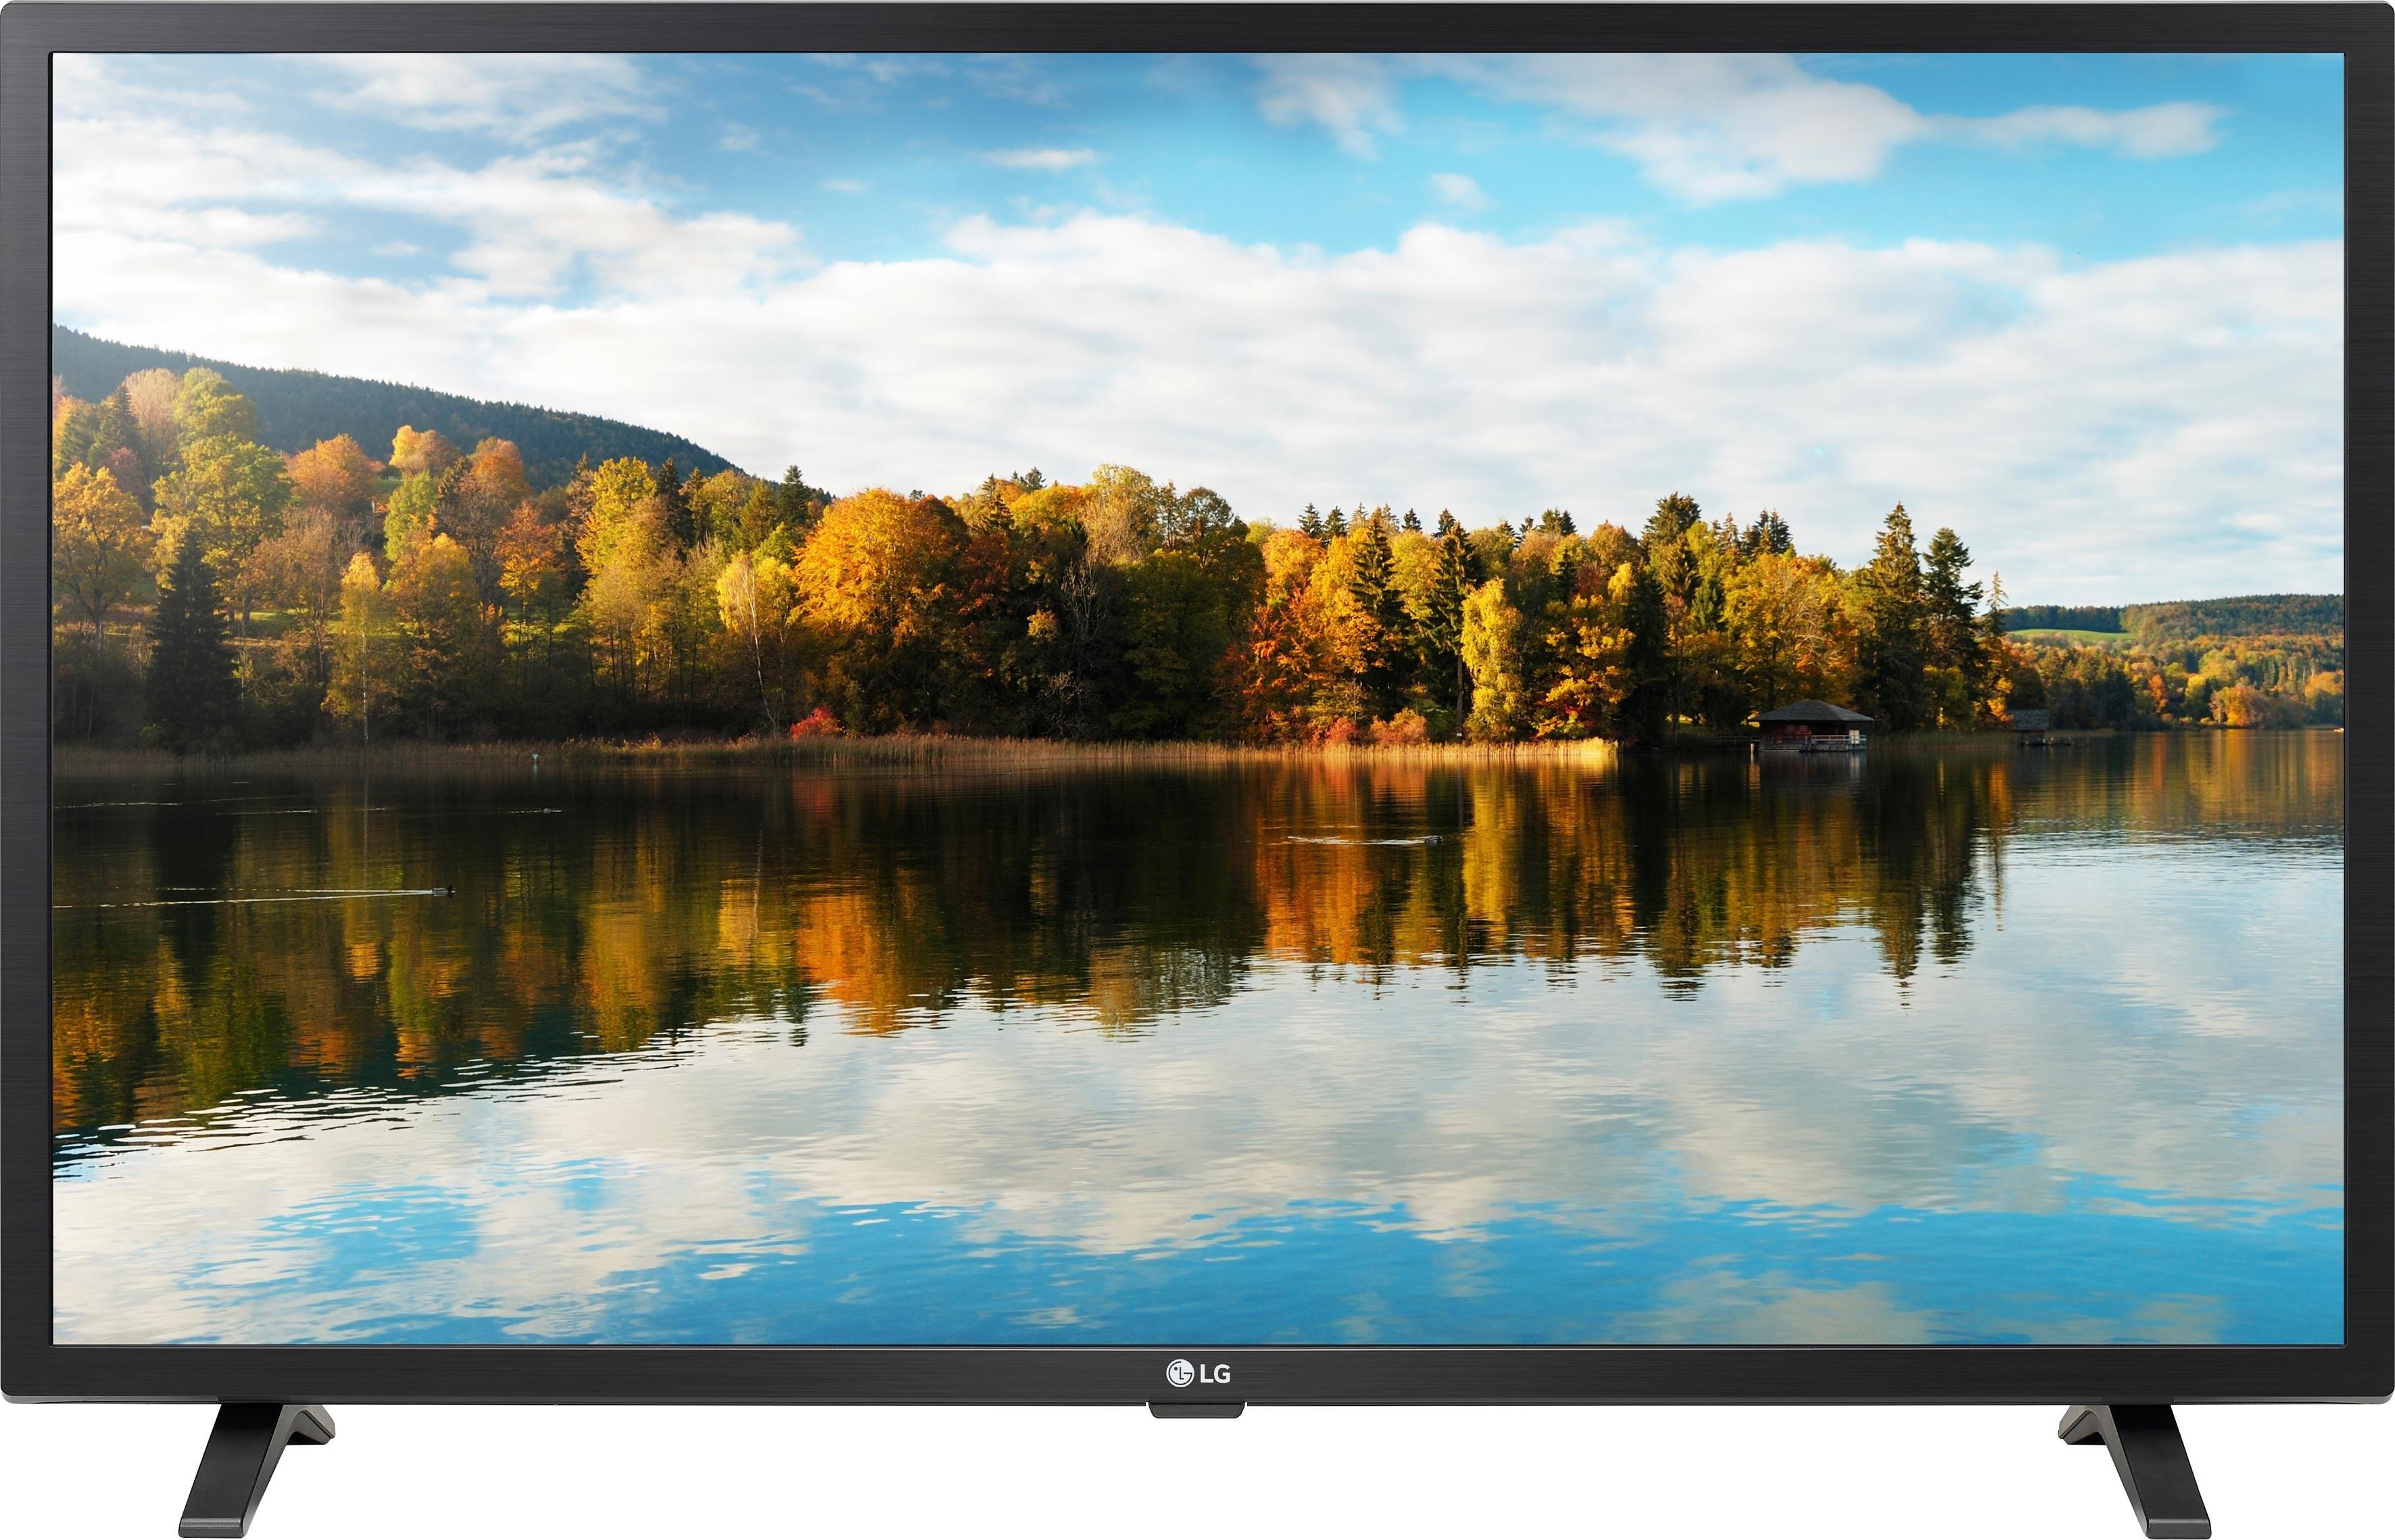 LG 32LM630BPLA led-tv (80 cm / 32 inch), HD-ready, Smart-TV online kopen op otto.nl